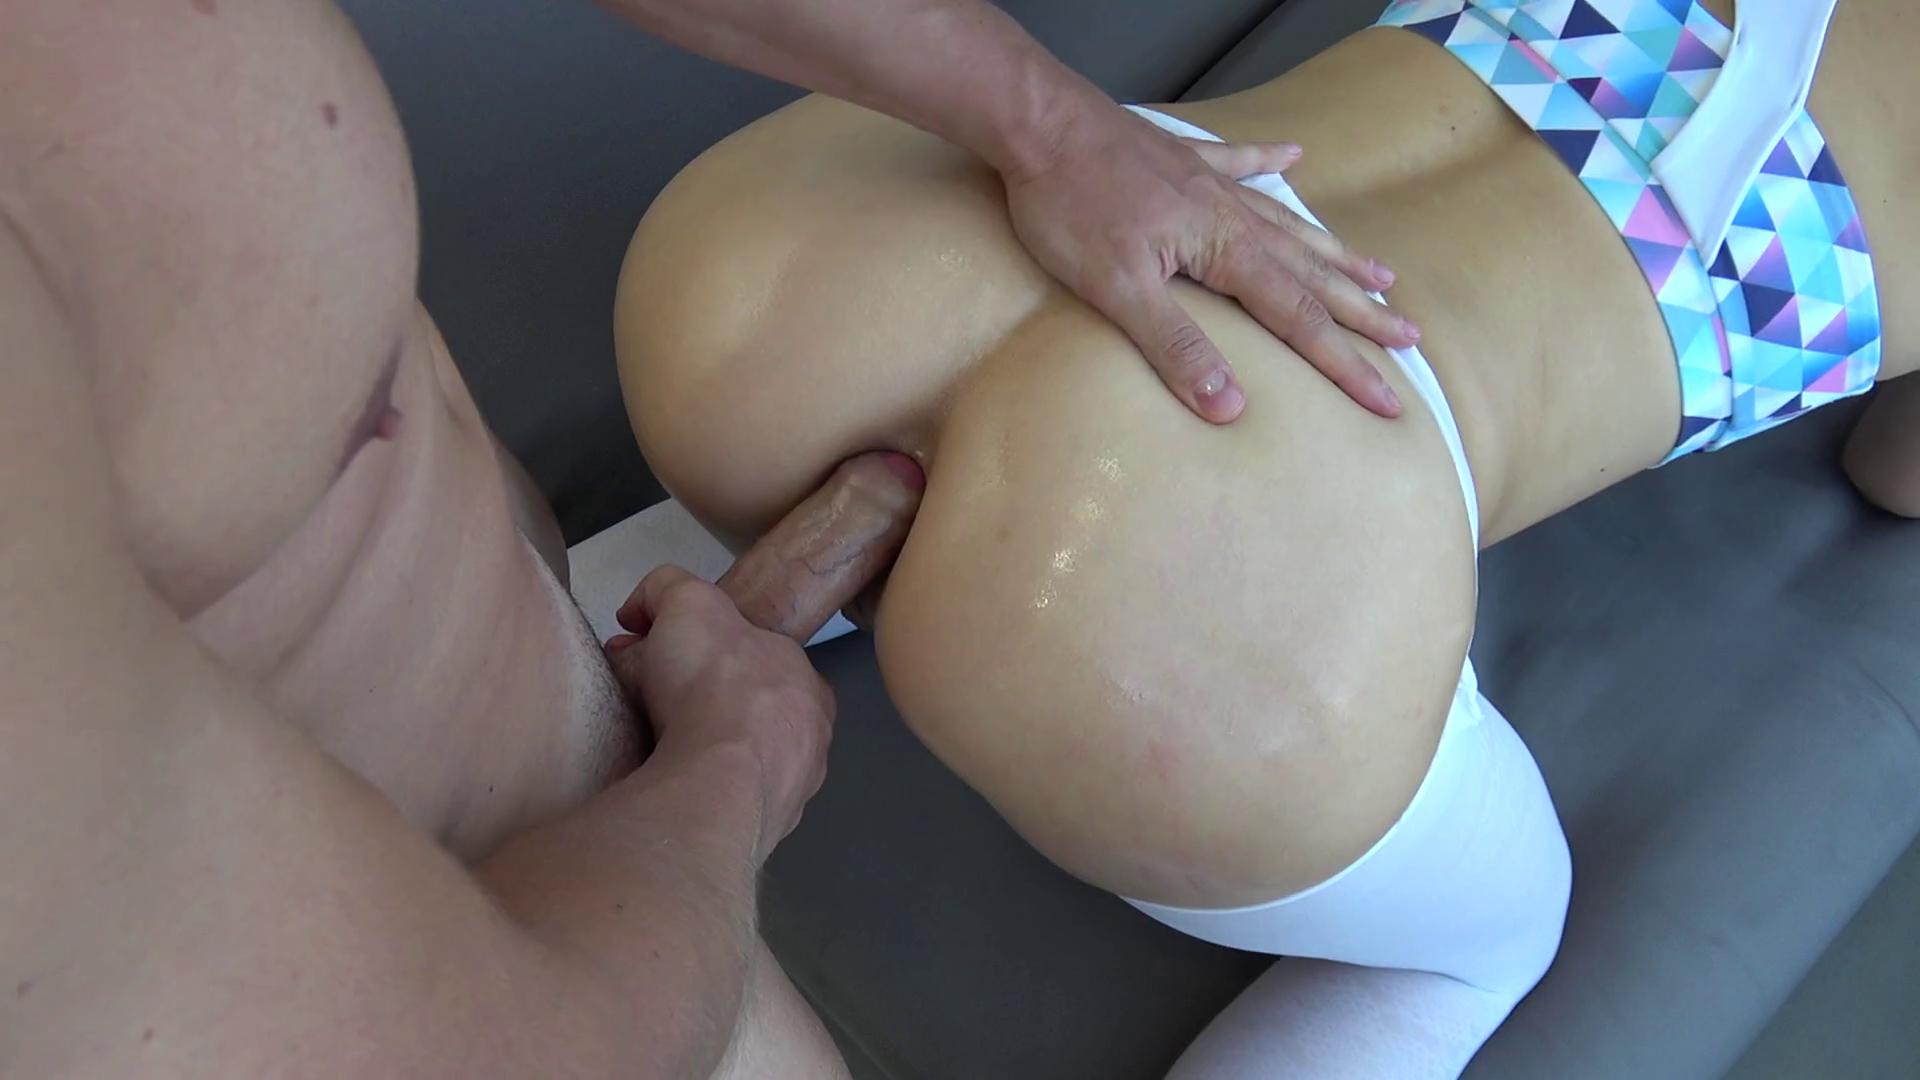 Huge cum in the ass